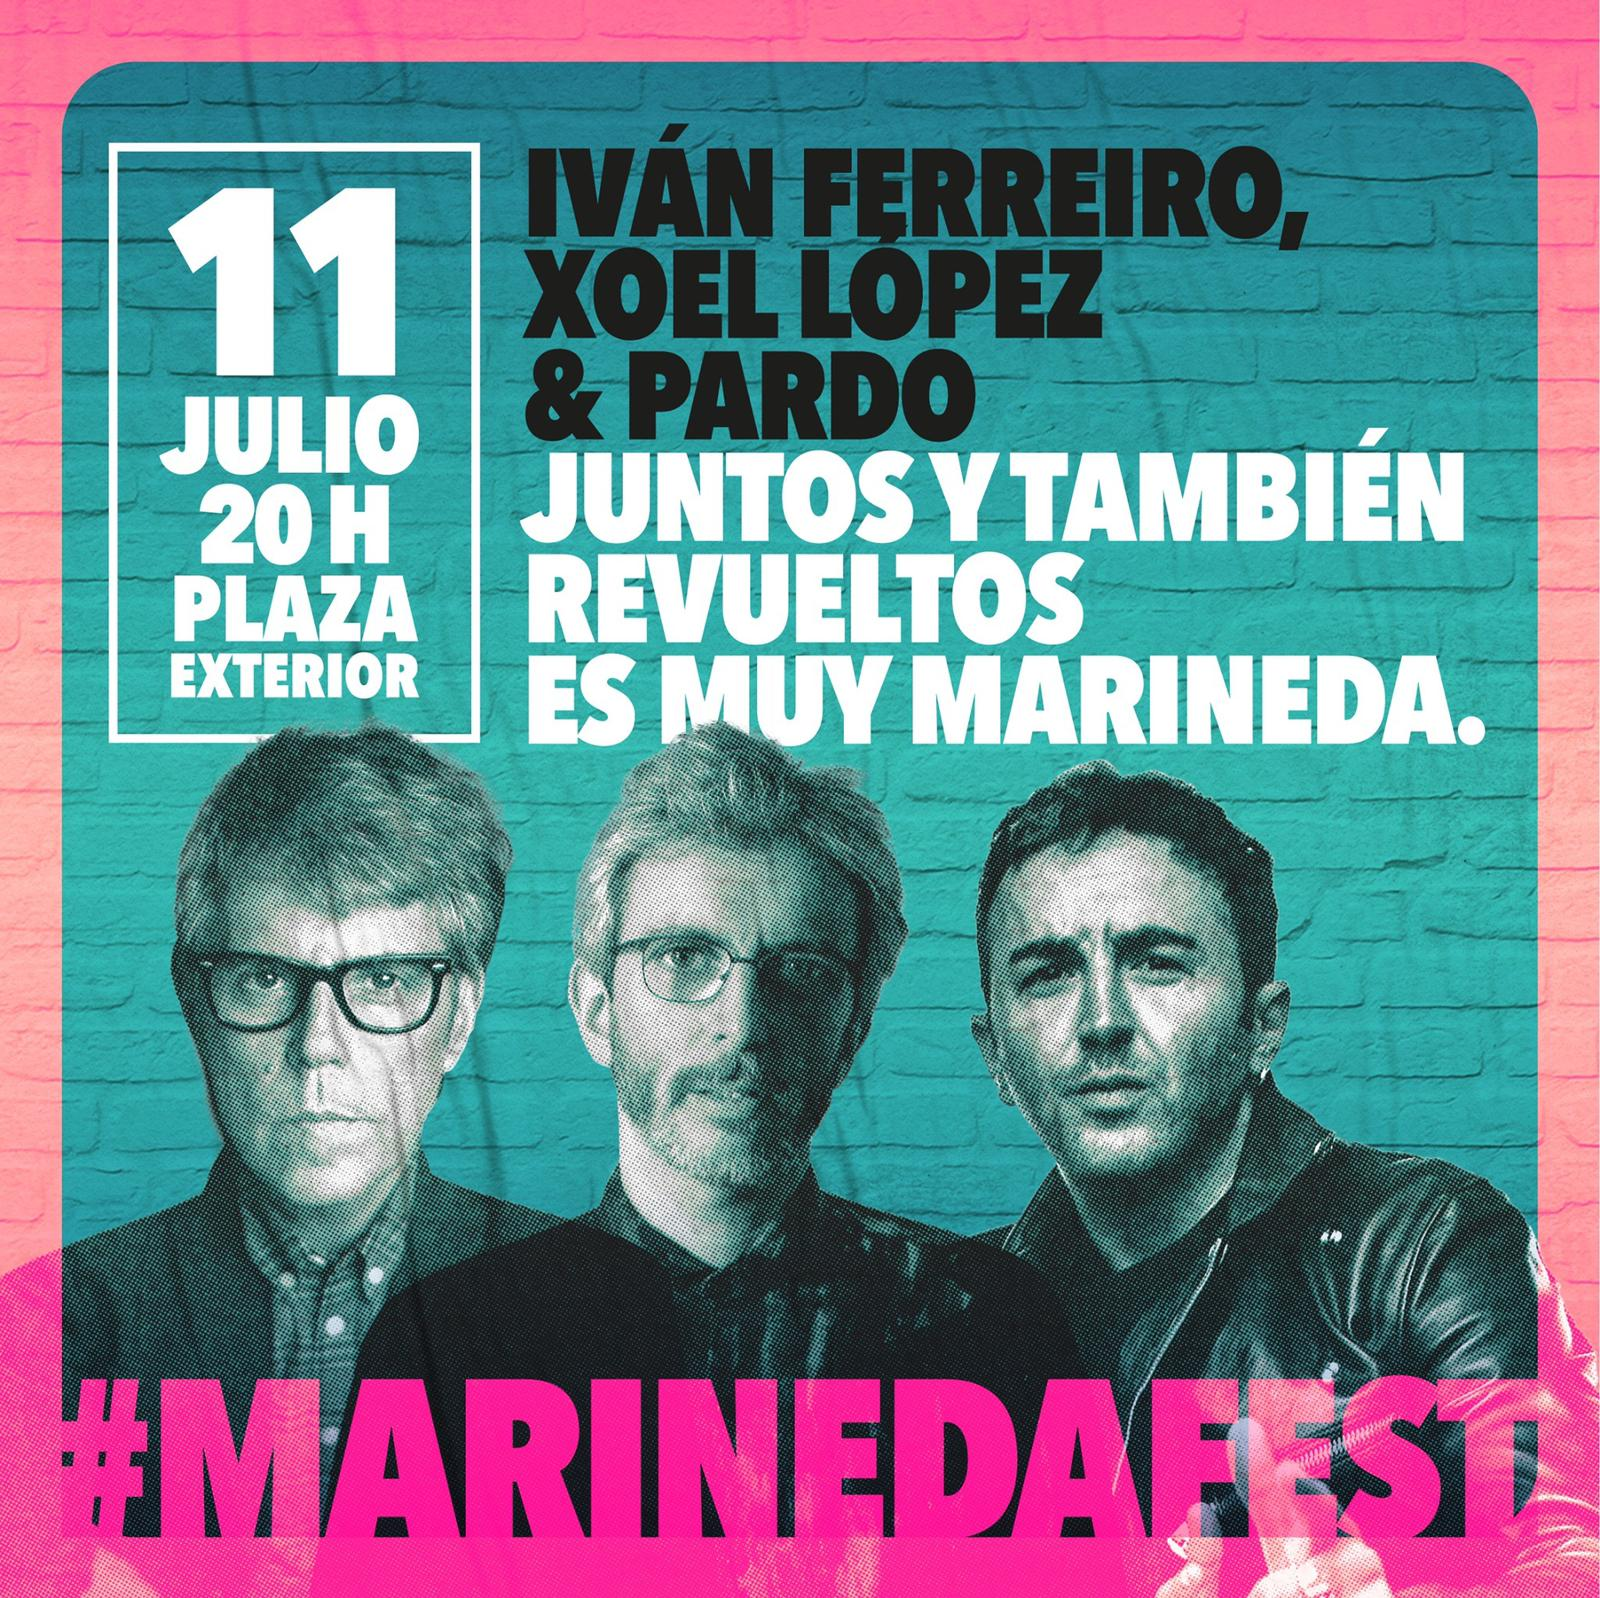 MARINEDA FEST - MUSICSOFT - ELEMENTAL CHEFS (3)